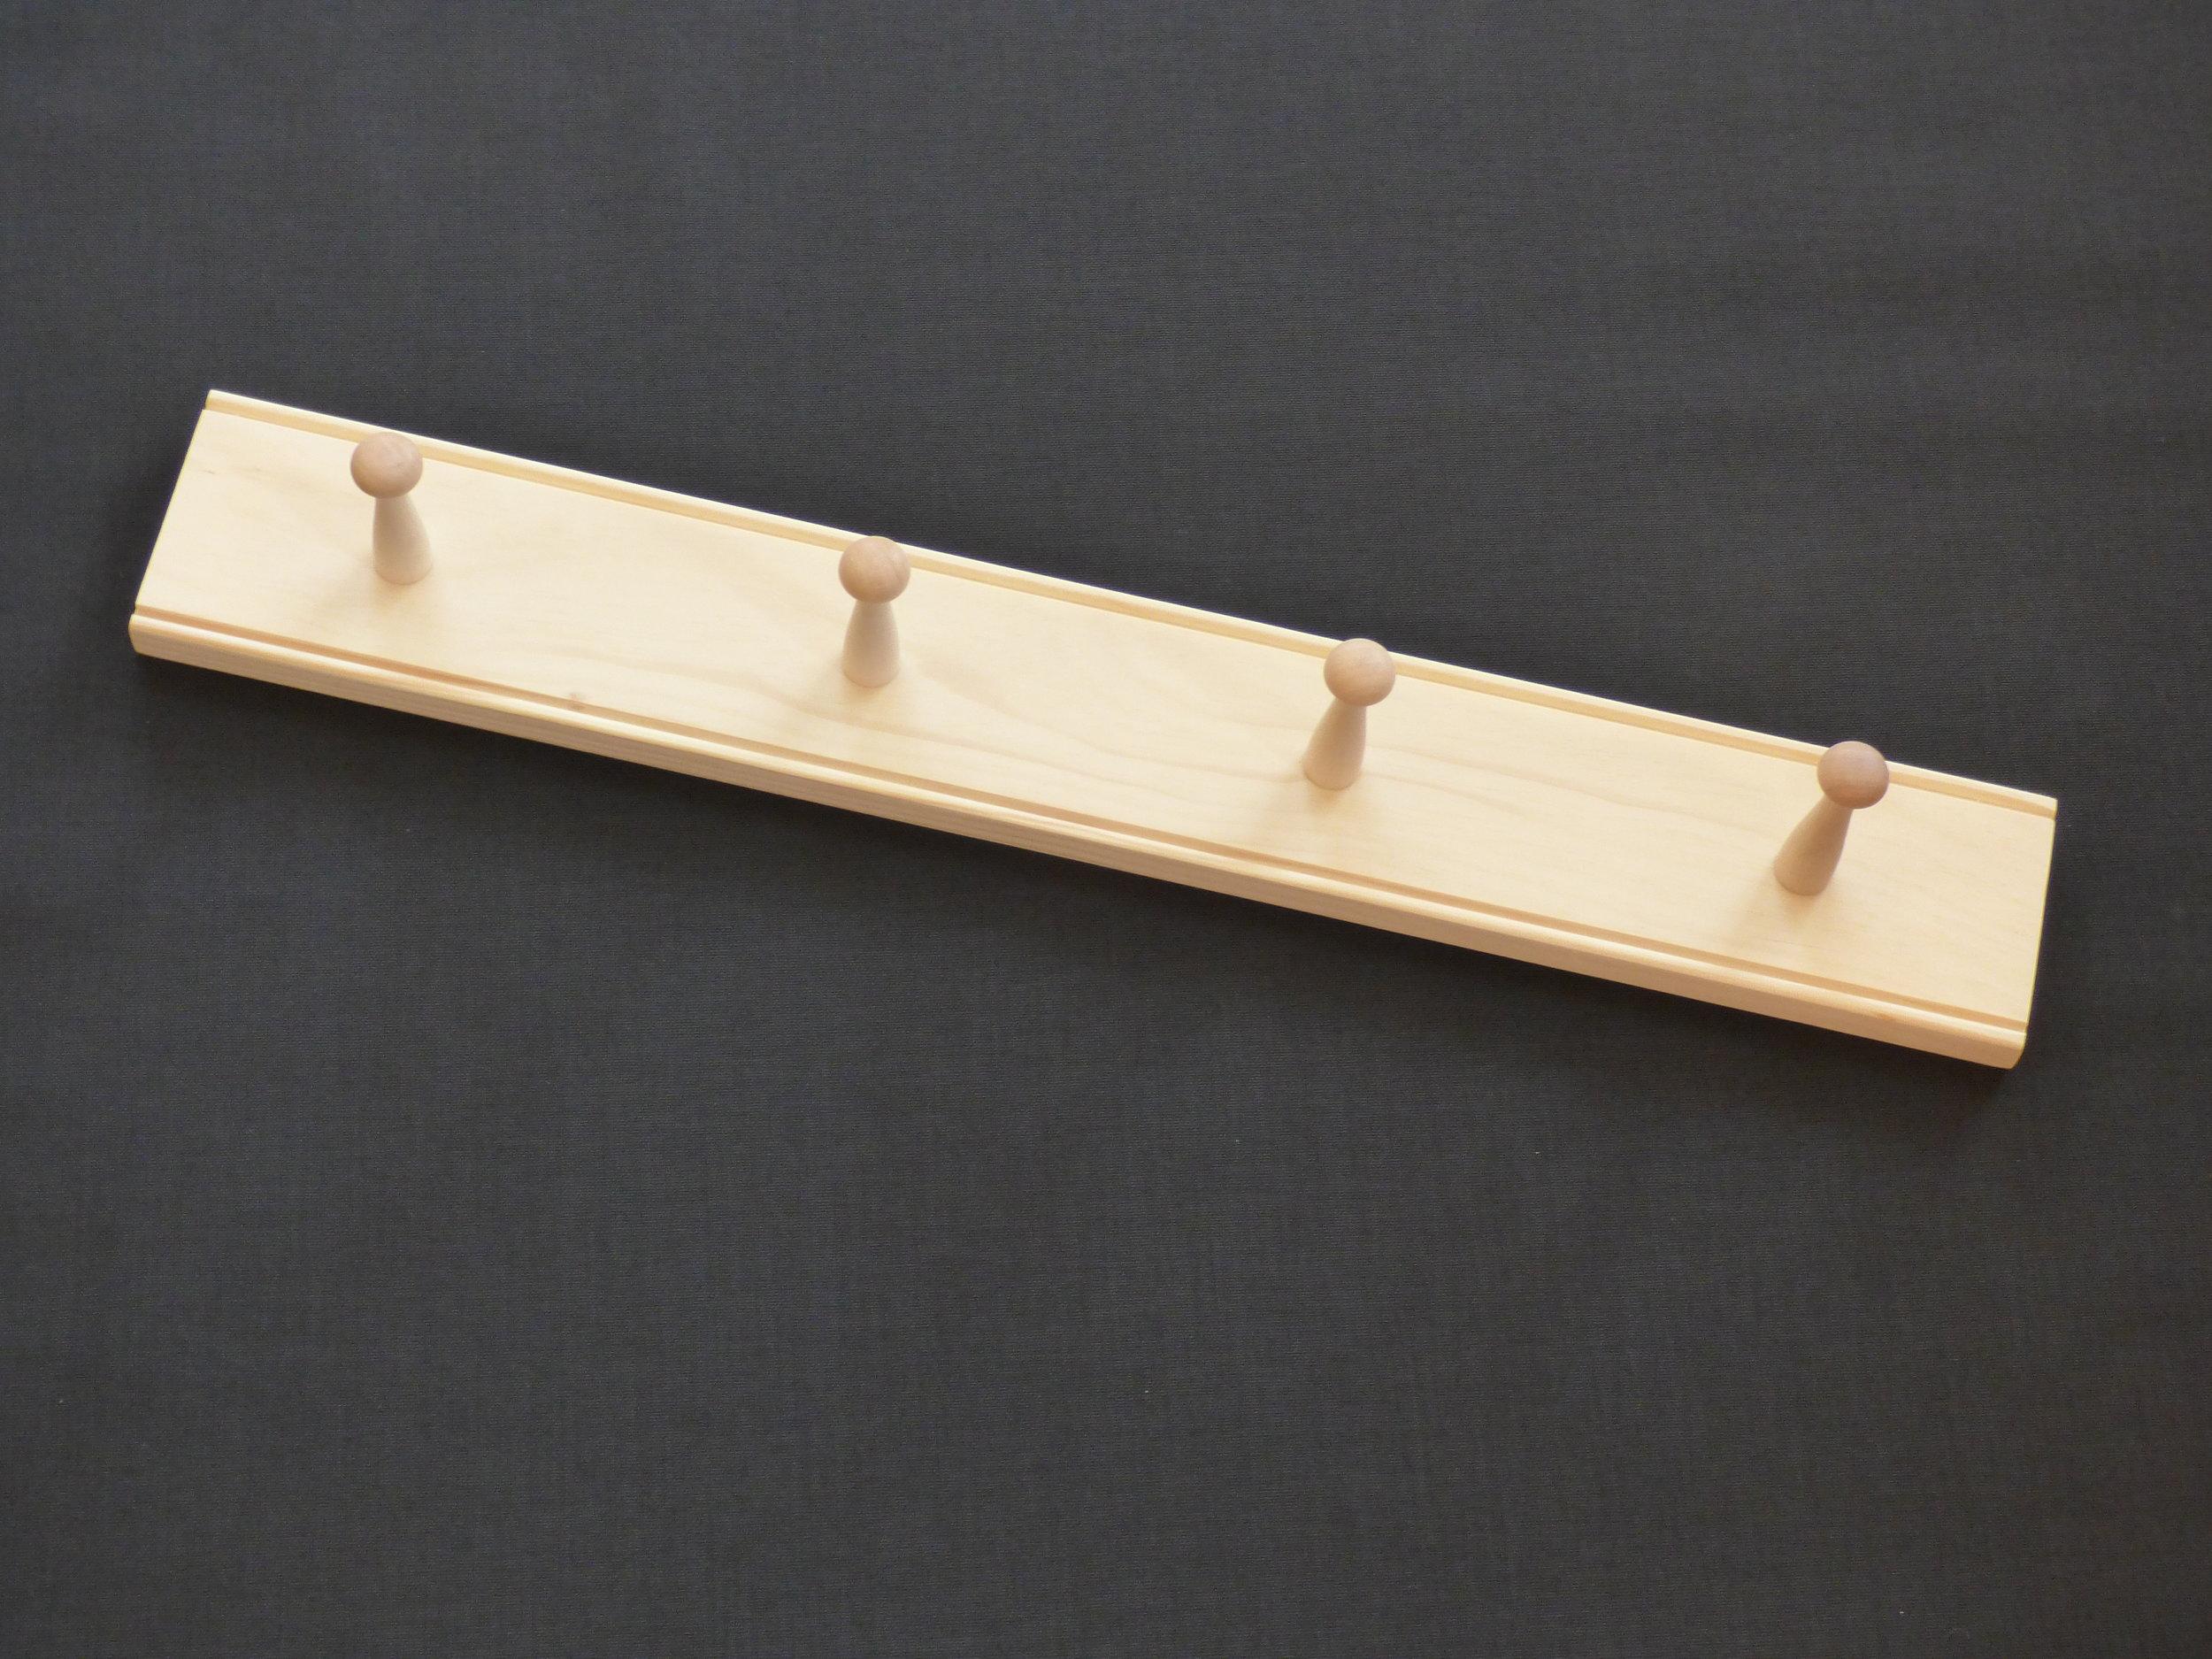 2' pine rail